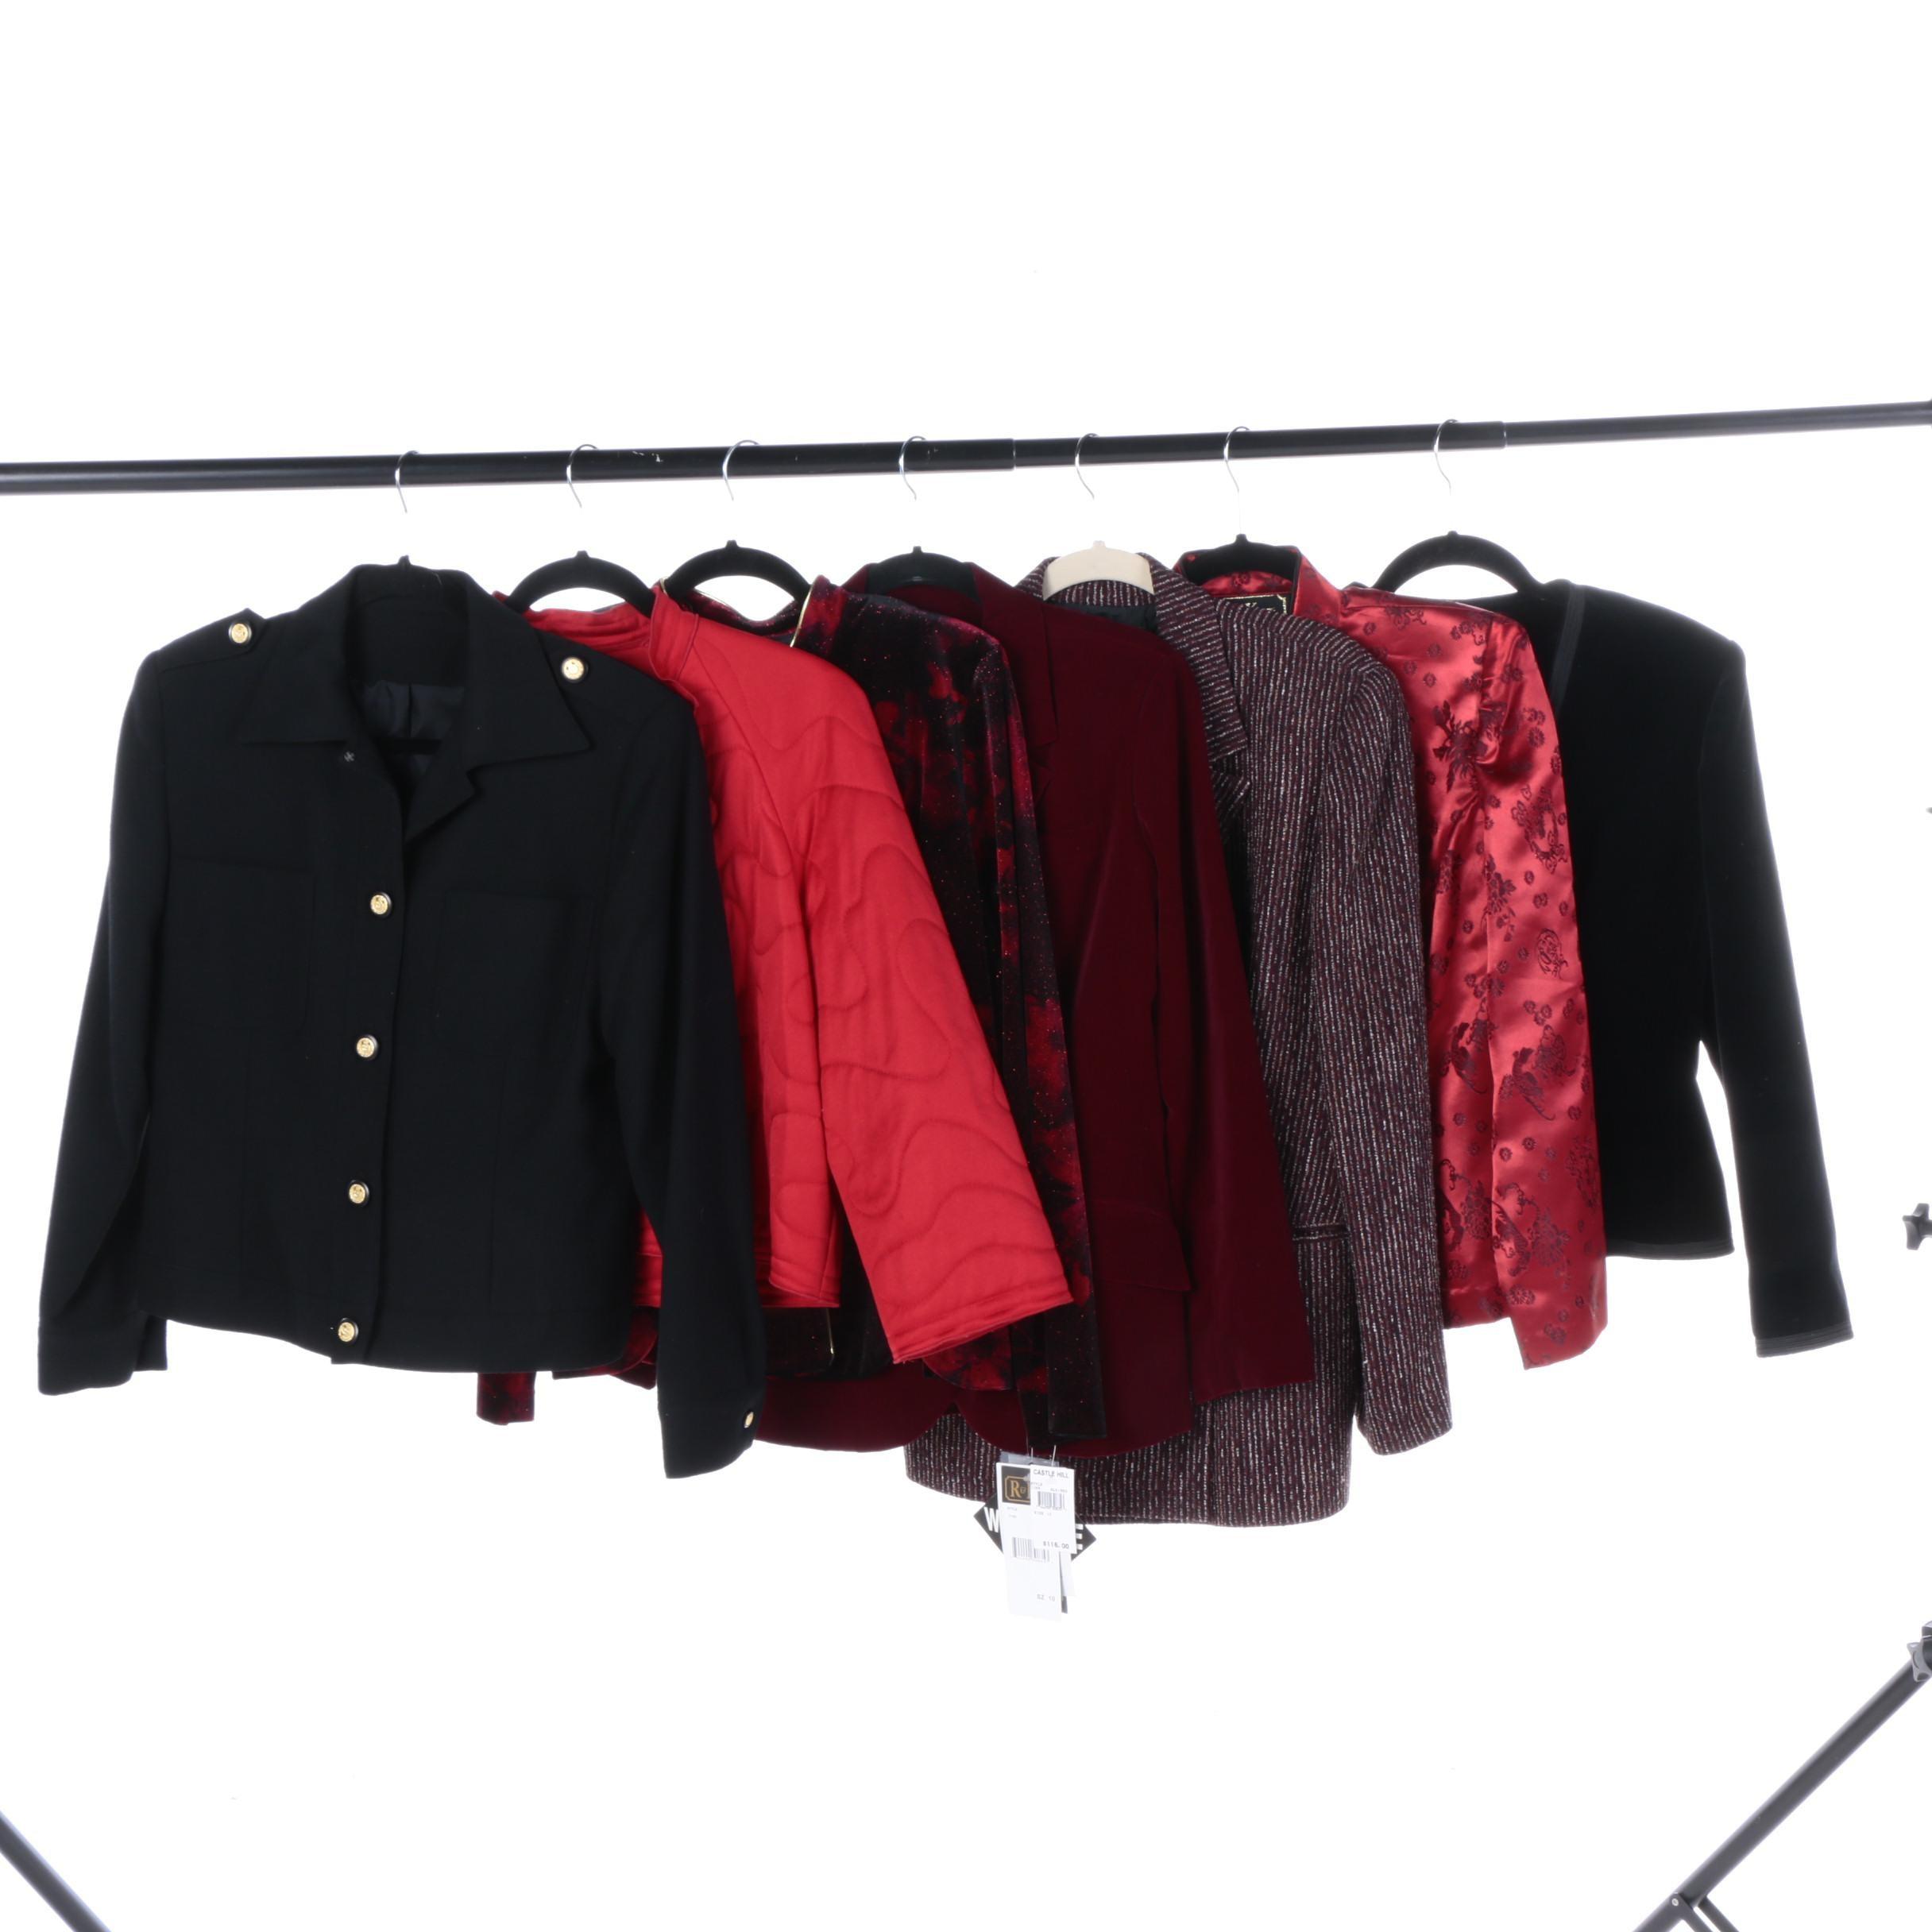 Women's Jackets Including R&K Evening